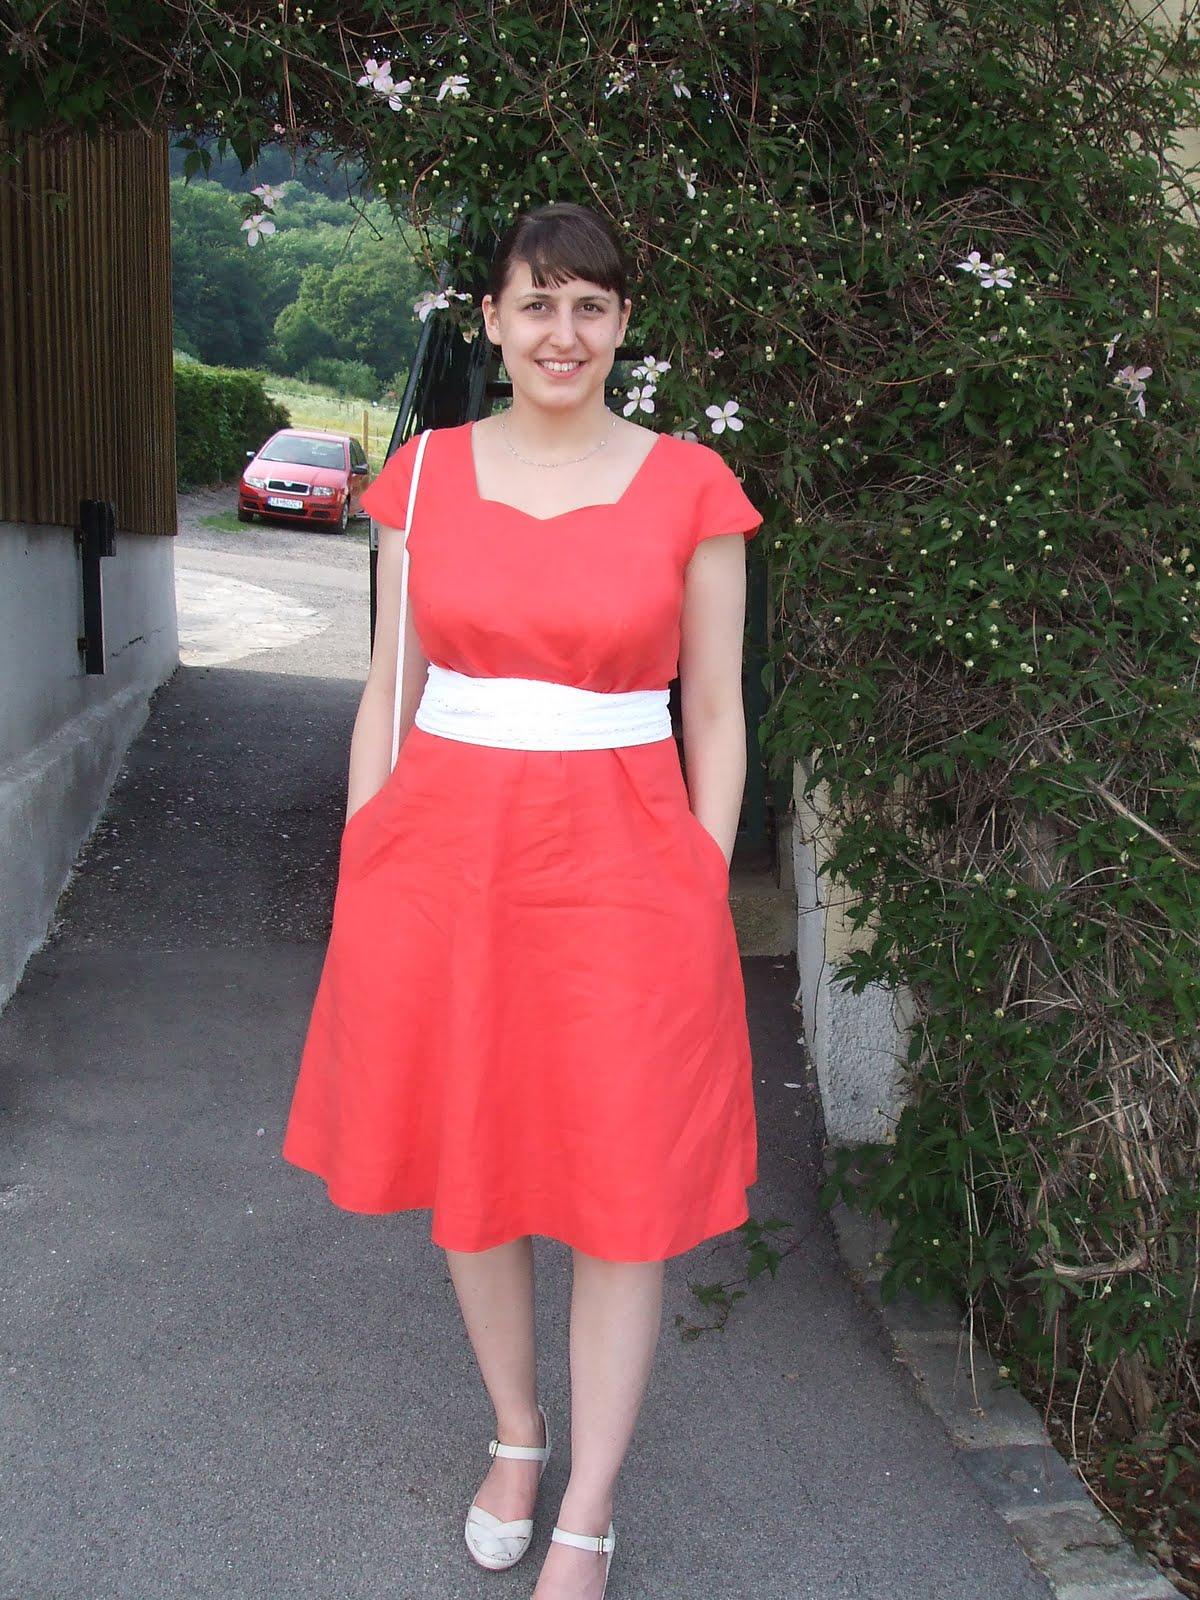 Light Salmon Colored Dress